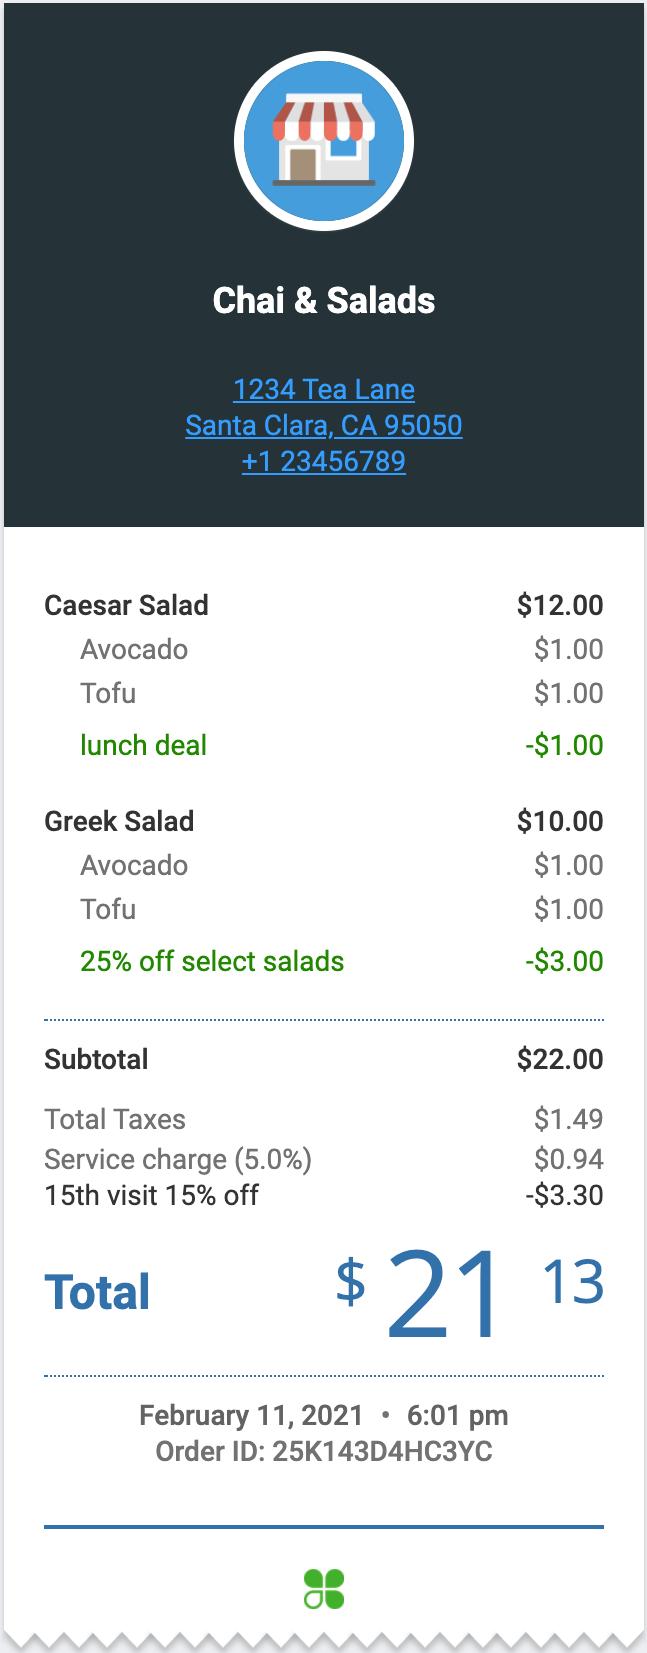 Sample order receipt